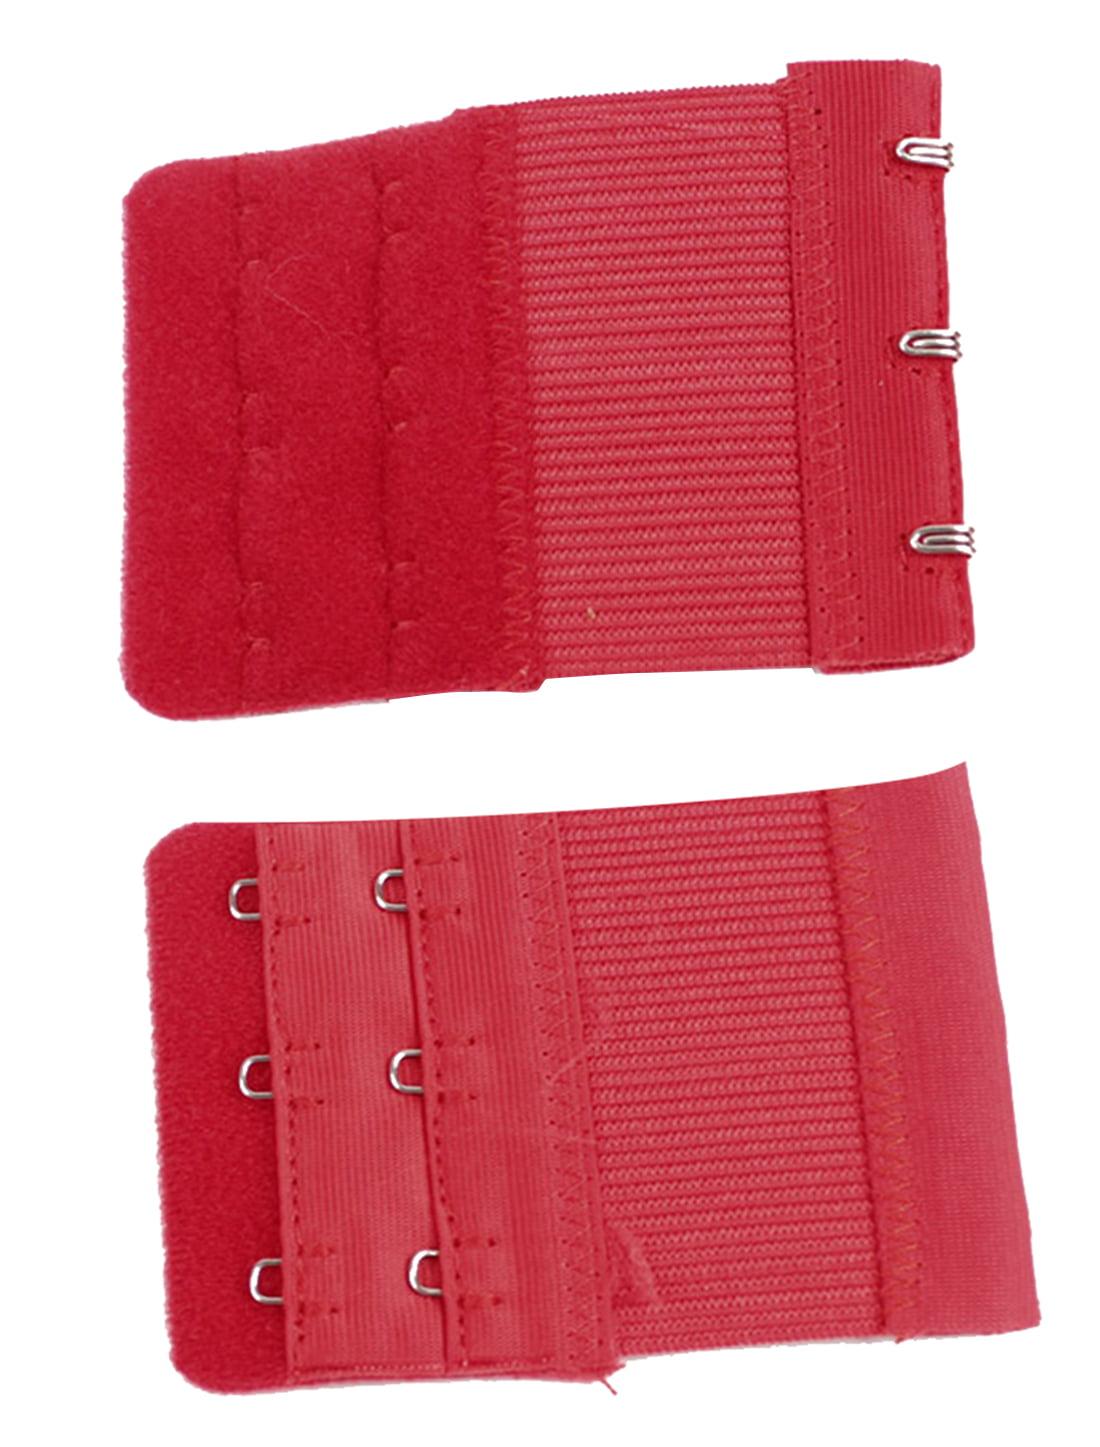 sourcing map Cotton Blends Women 3 Rows 3 Hooks Underwear Brassiere Bra Extender Extension 2pcs White